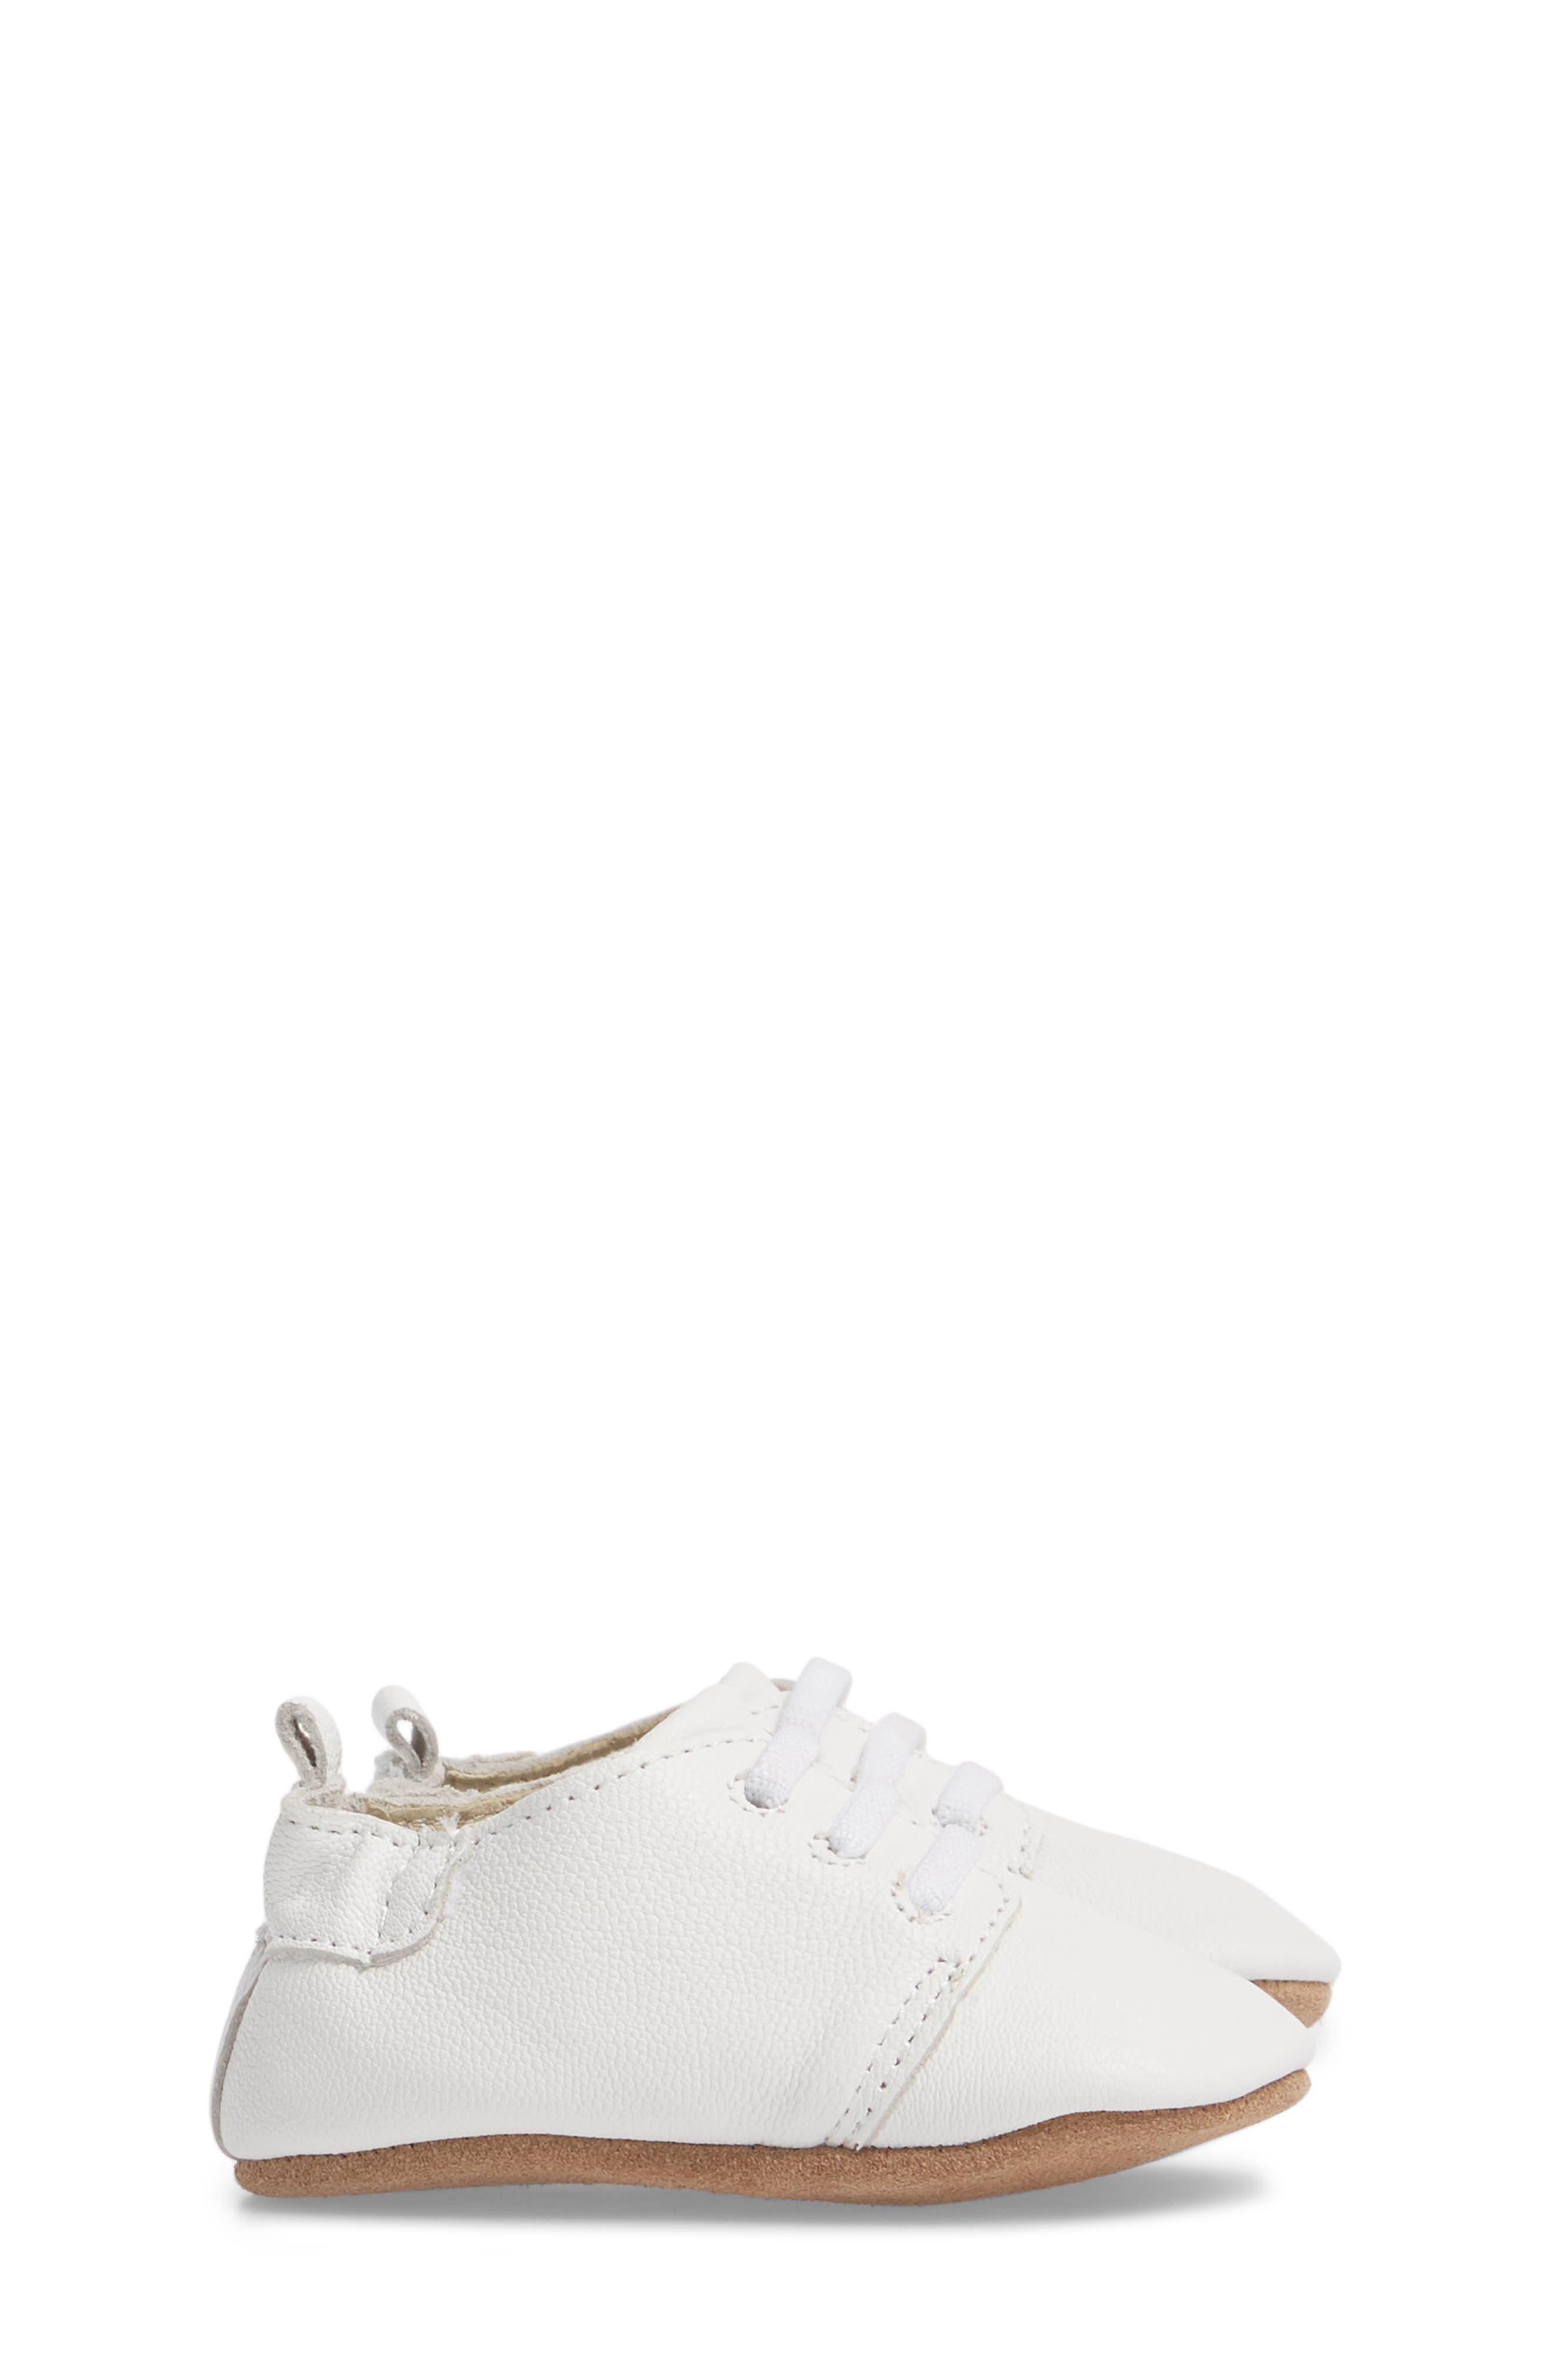 ROBEEZ<SUP>®</SUP>, Owen Oxford Crib Shoe, Alternate thumbnail 3, color, WHITE